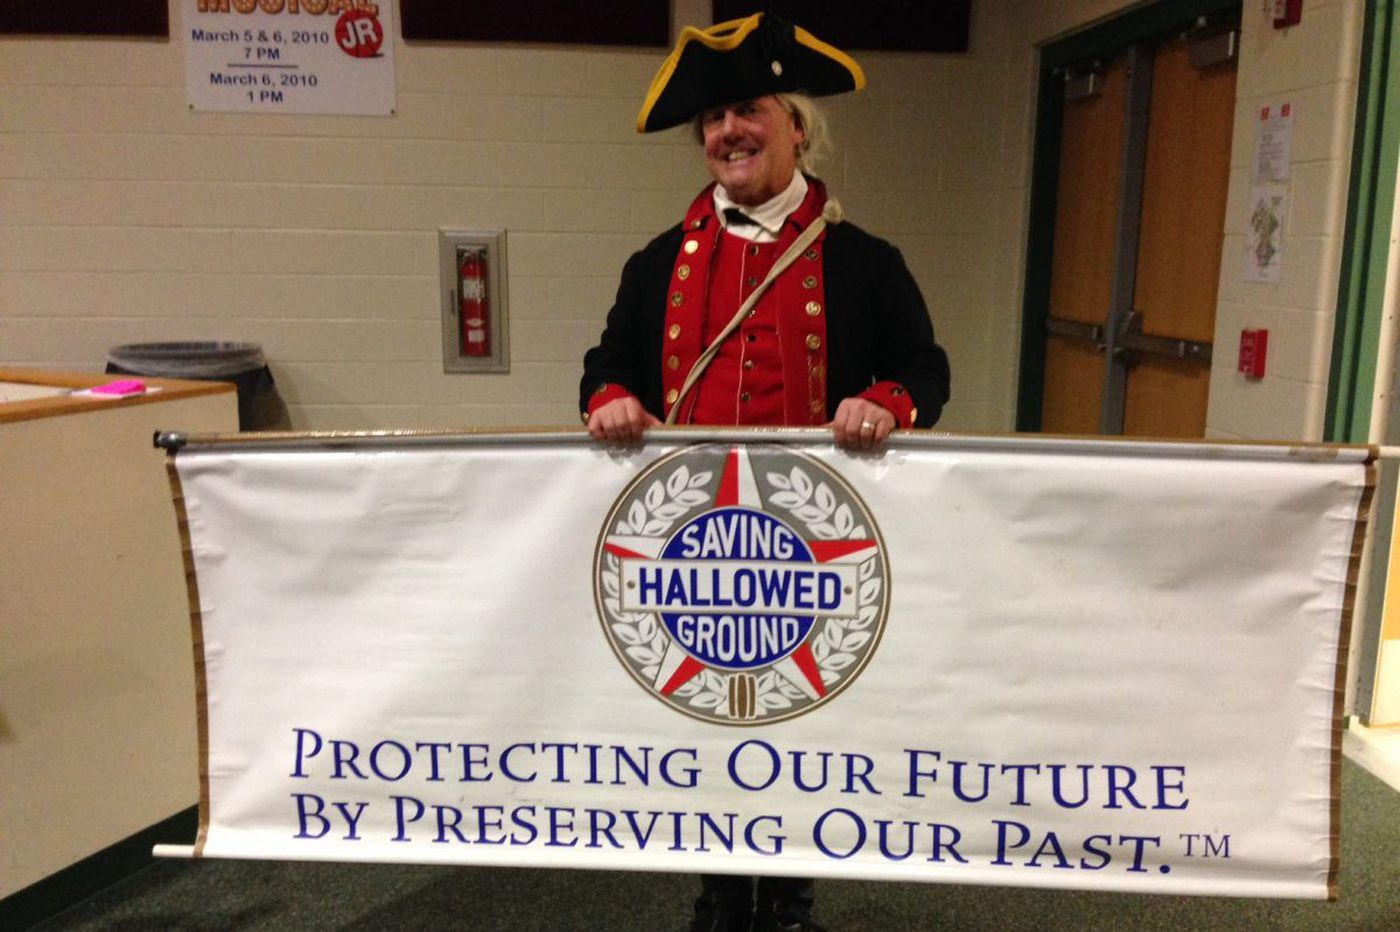 Toll Bros. is denied application to build 317 homes near Brandywine Battlefield